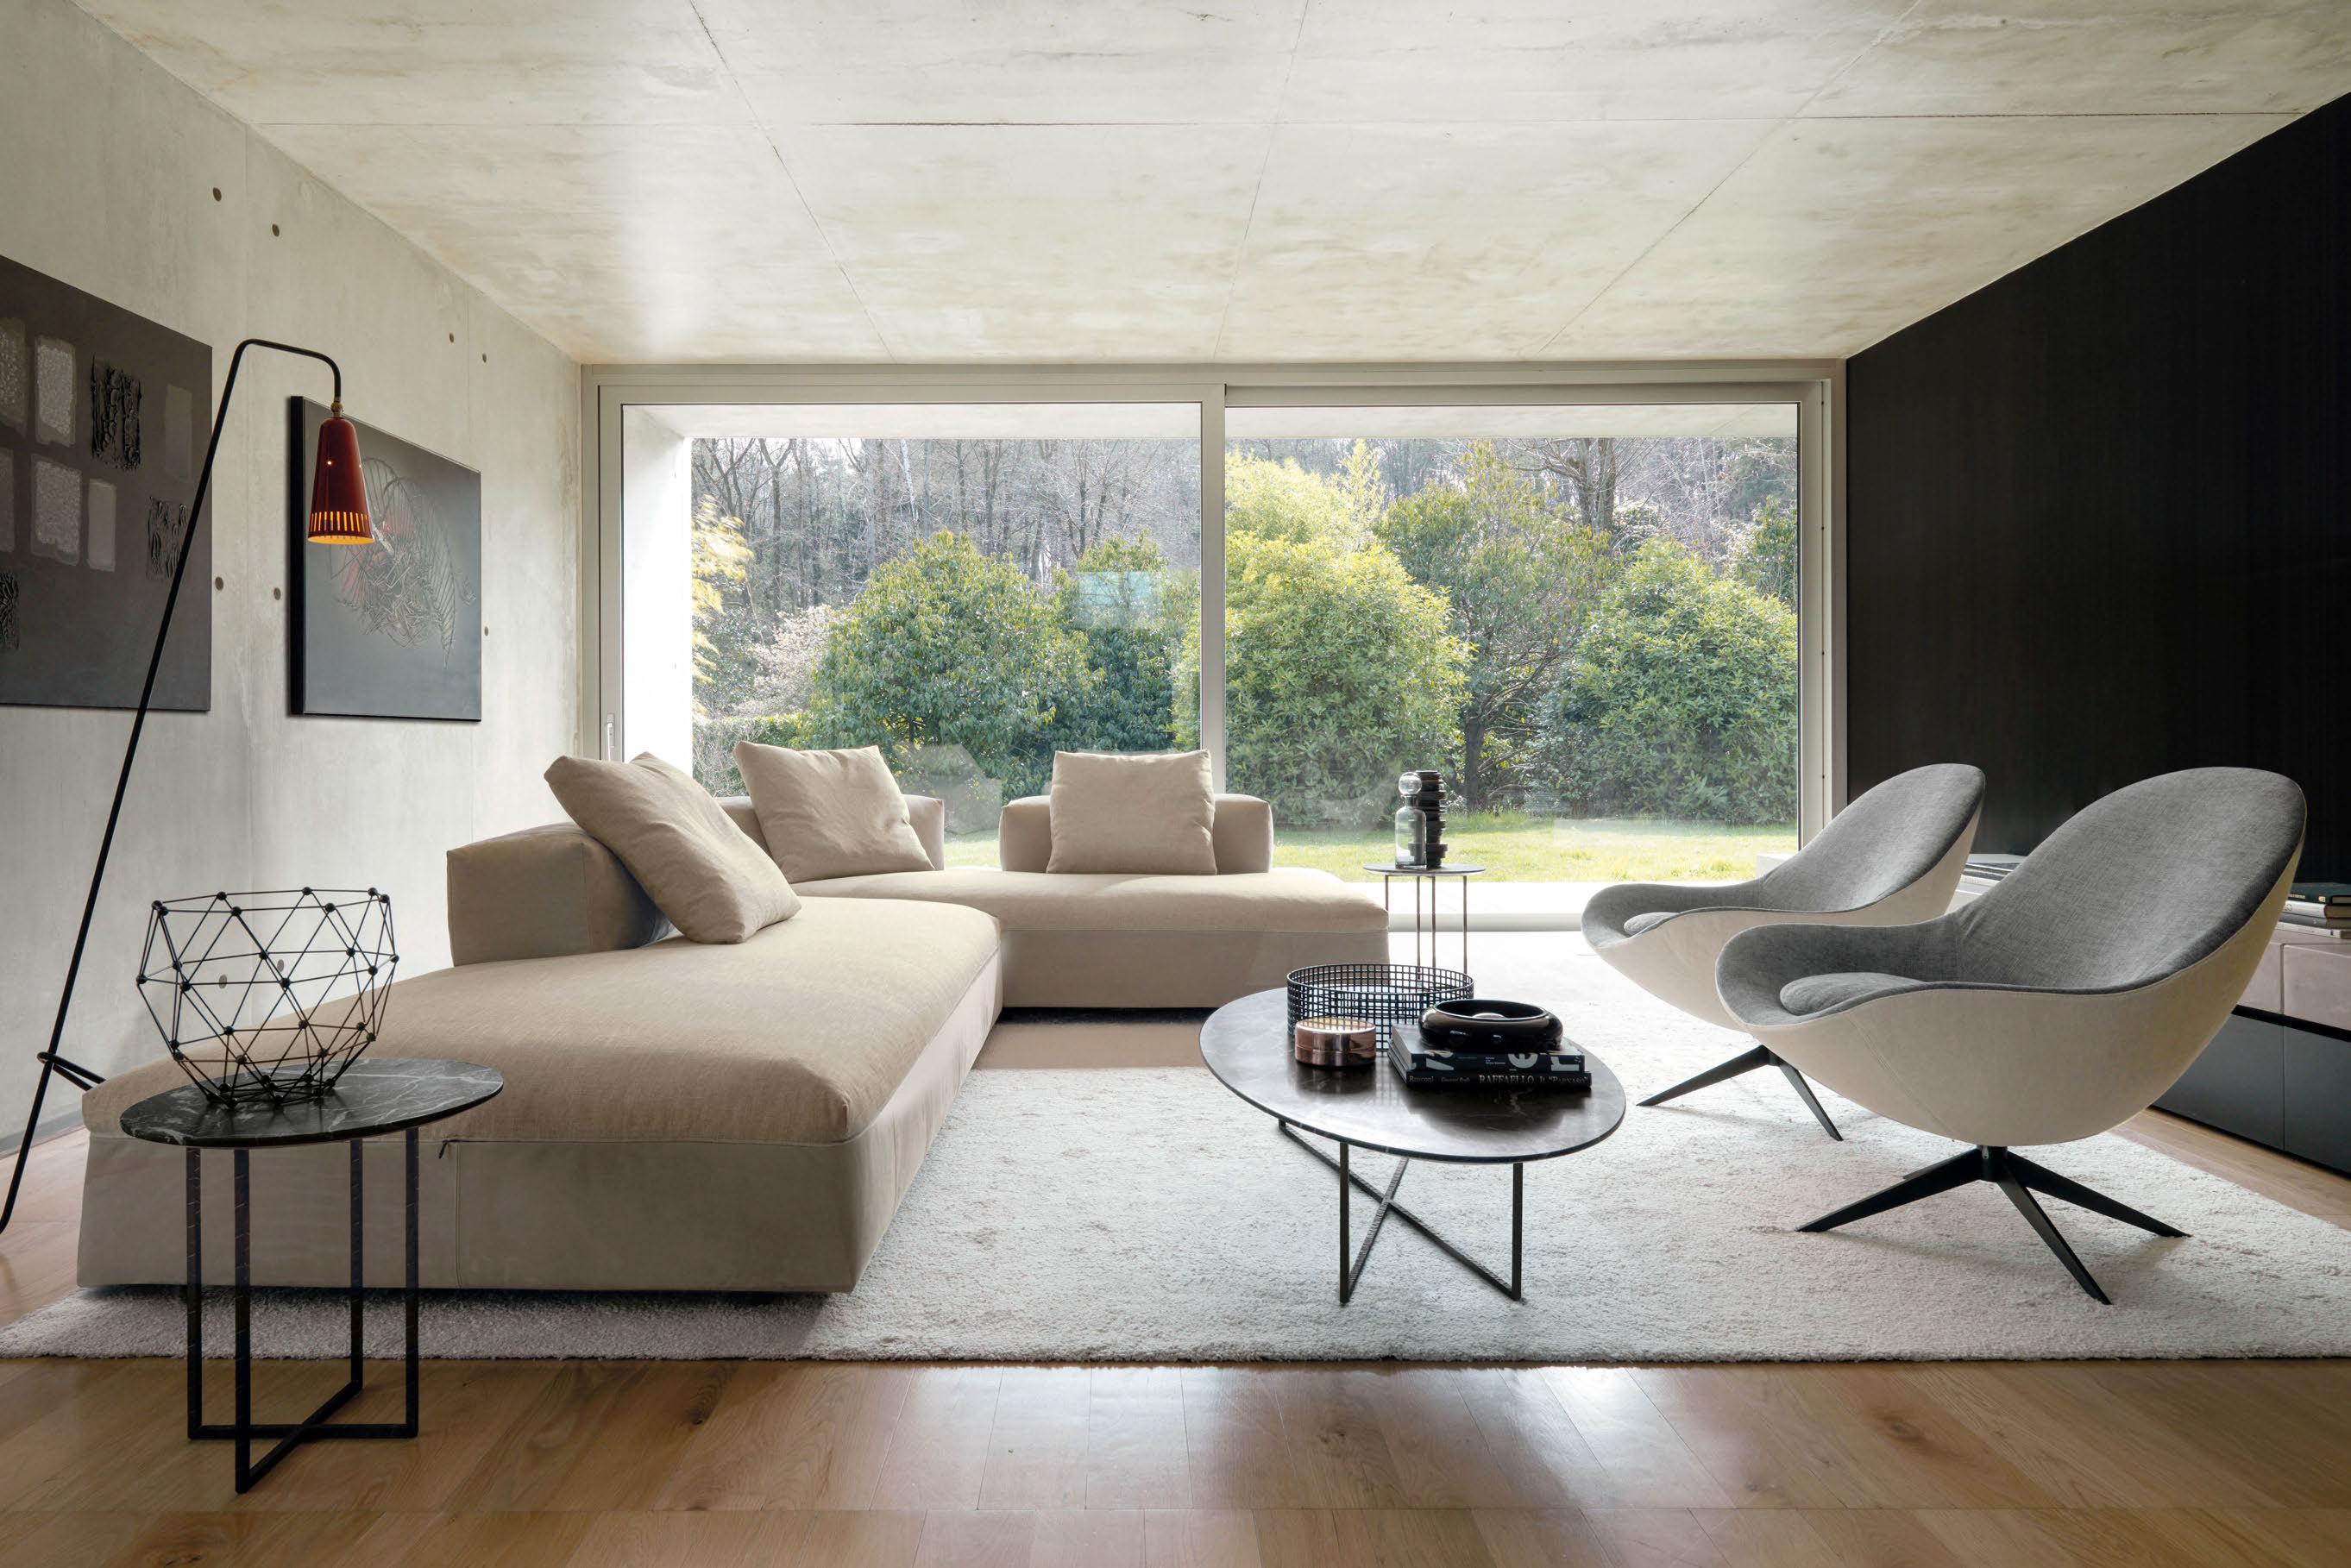 Luxury italian soor lounge chair italian designer for Living room lounge chair